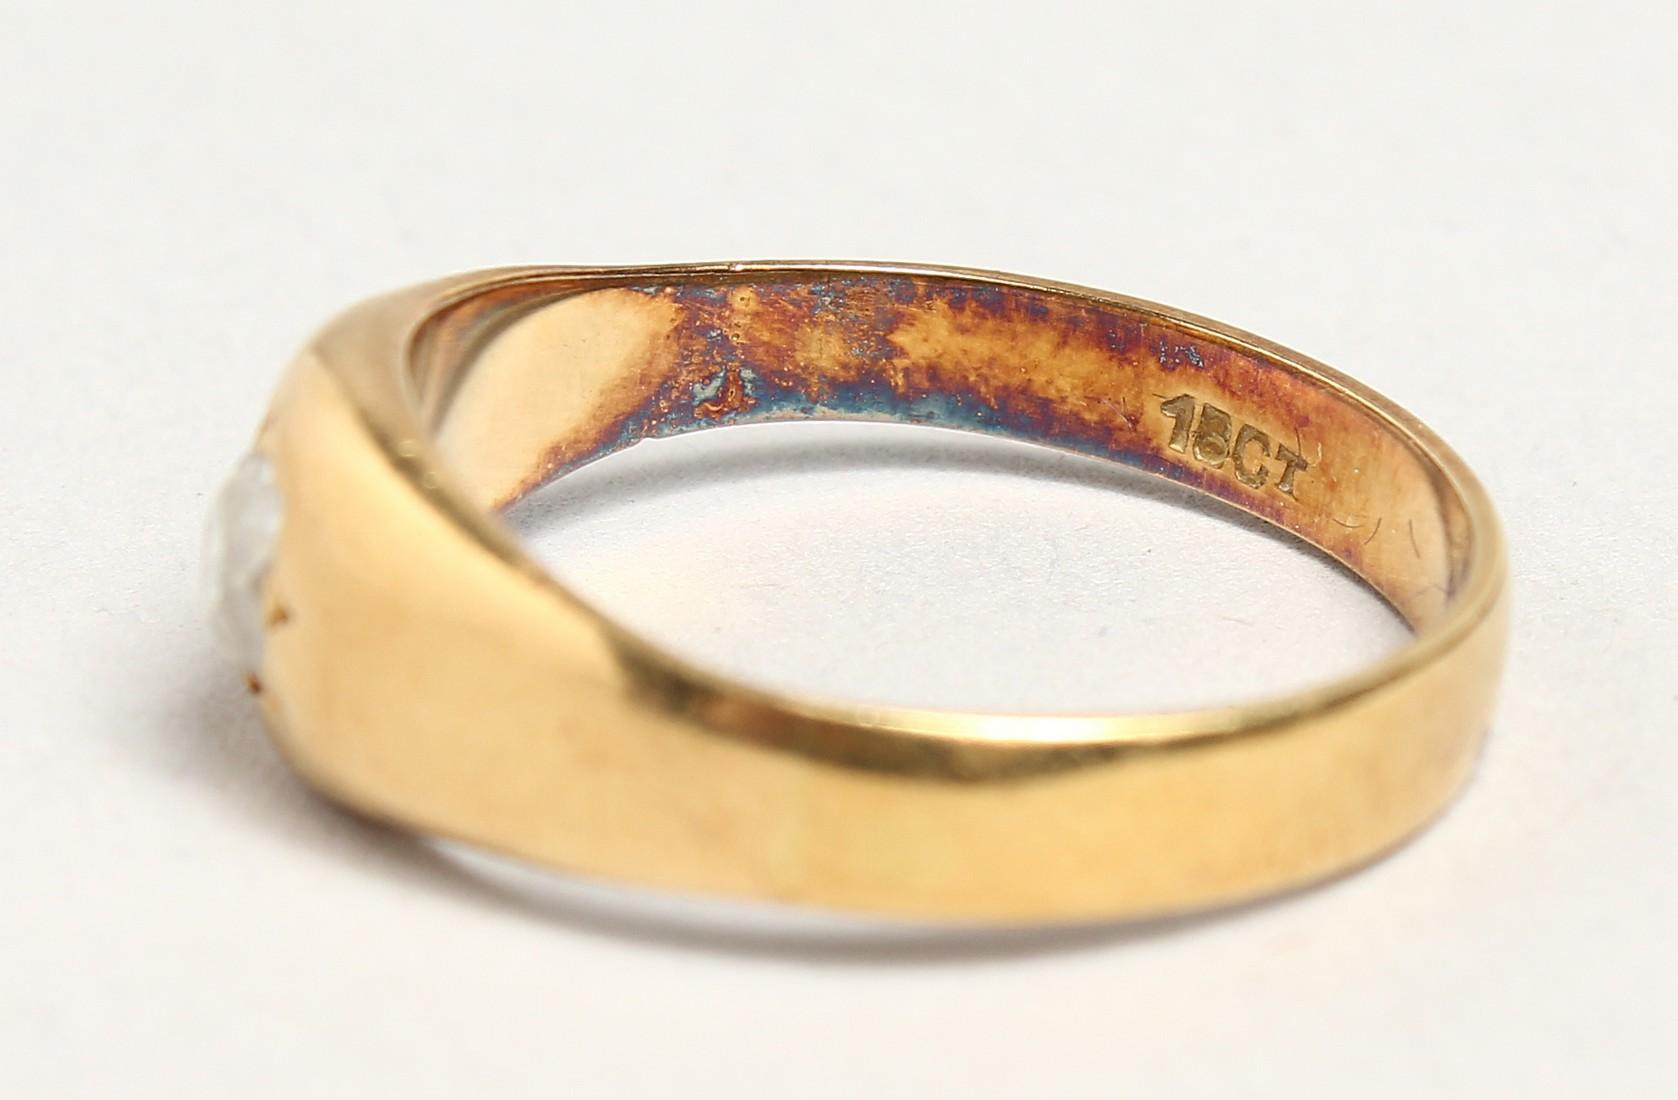 AN 18CT GOLD DIAMOND SET RING. - Image 2 of 4